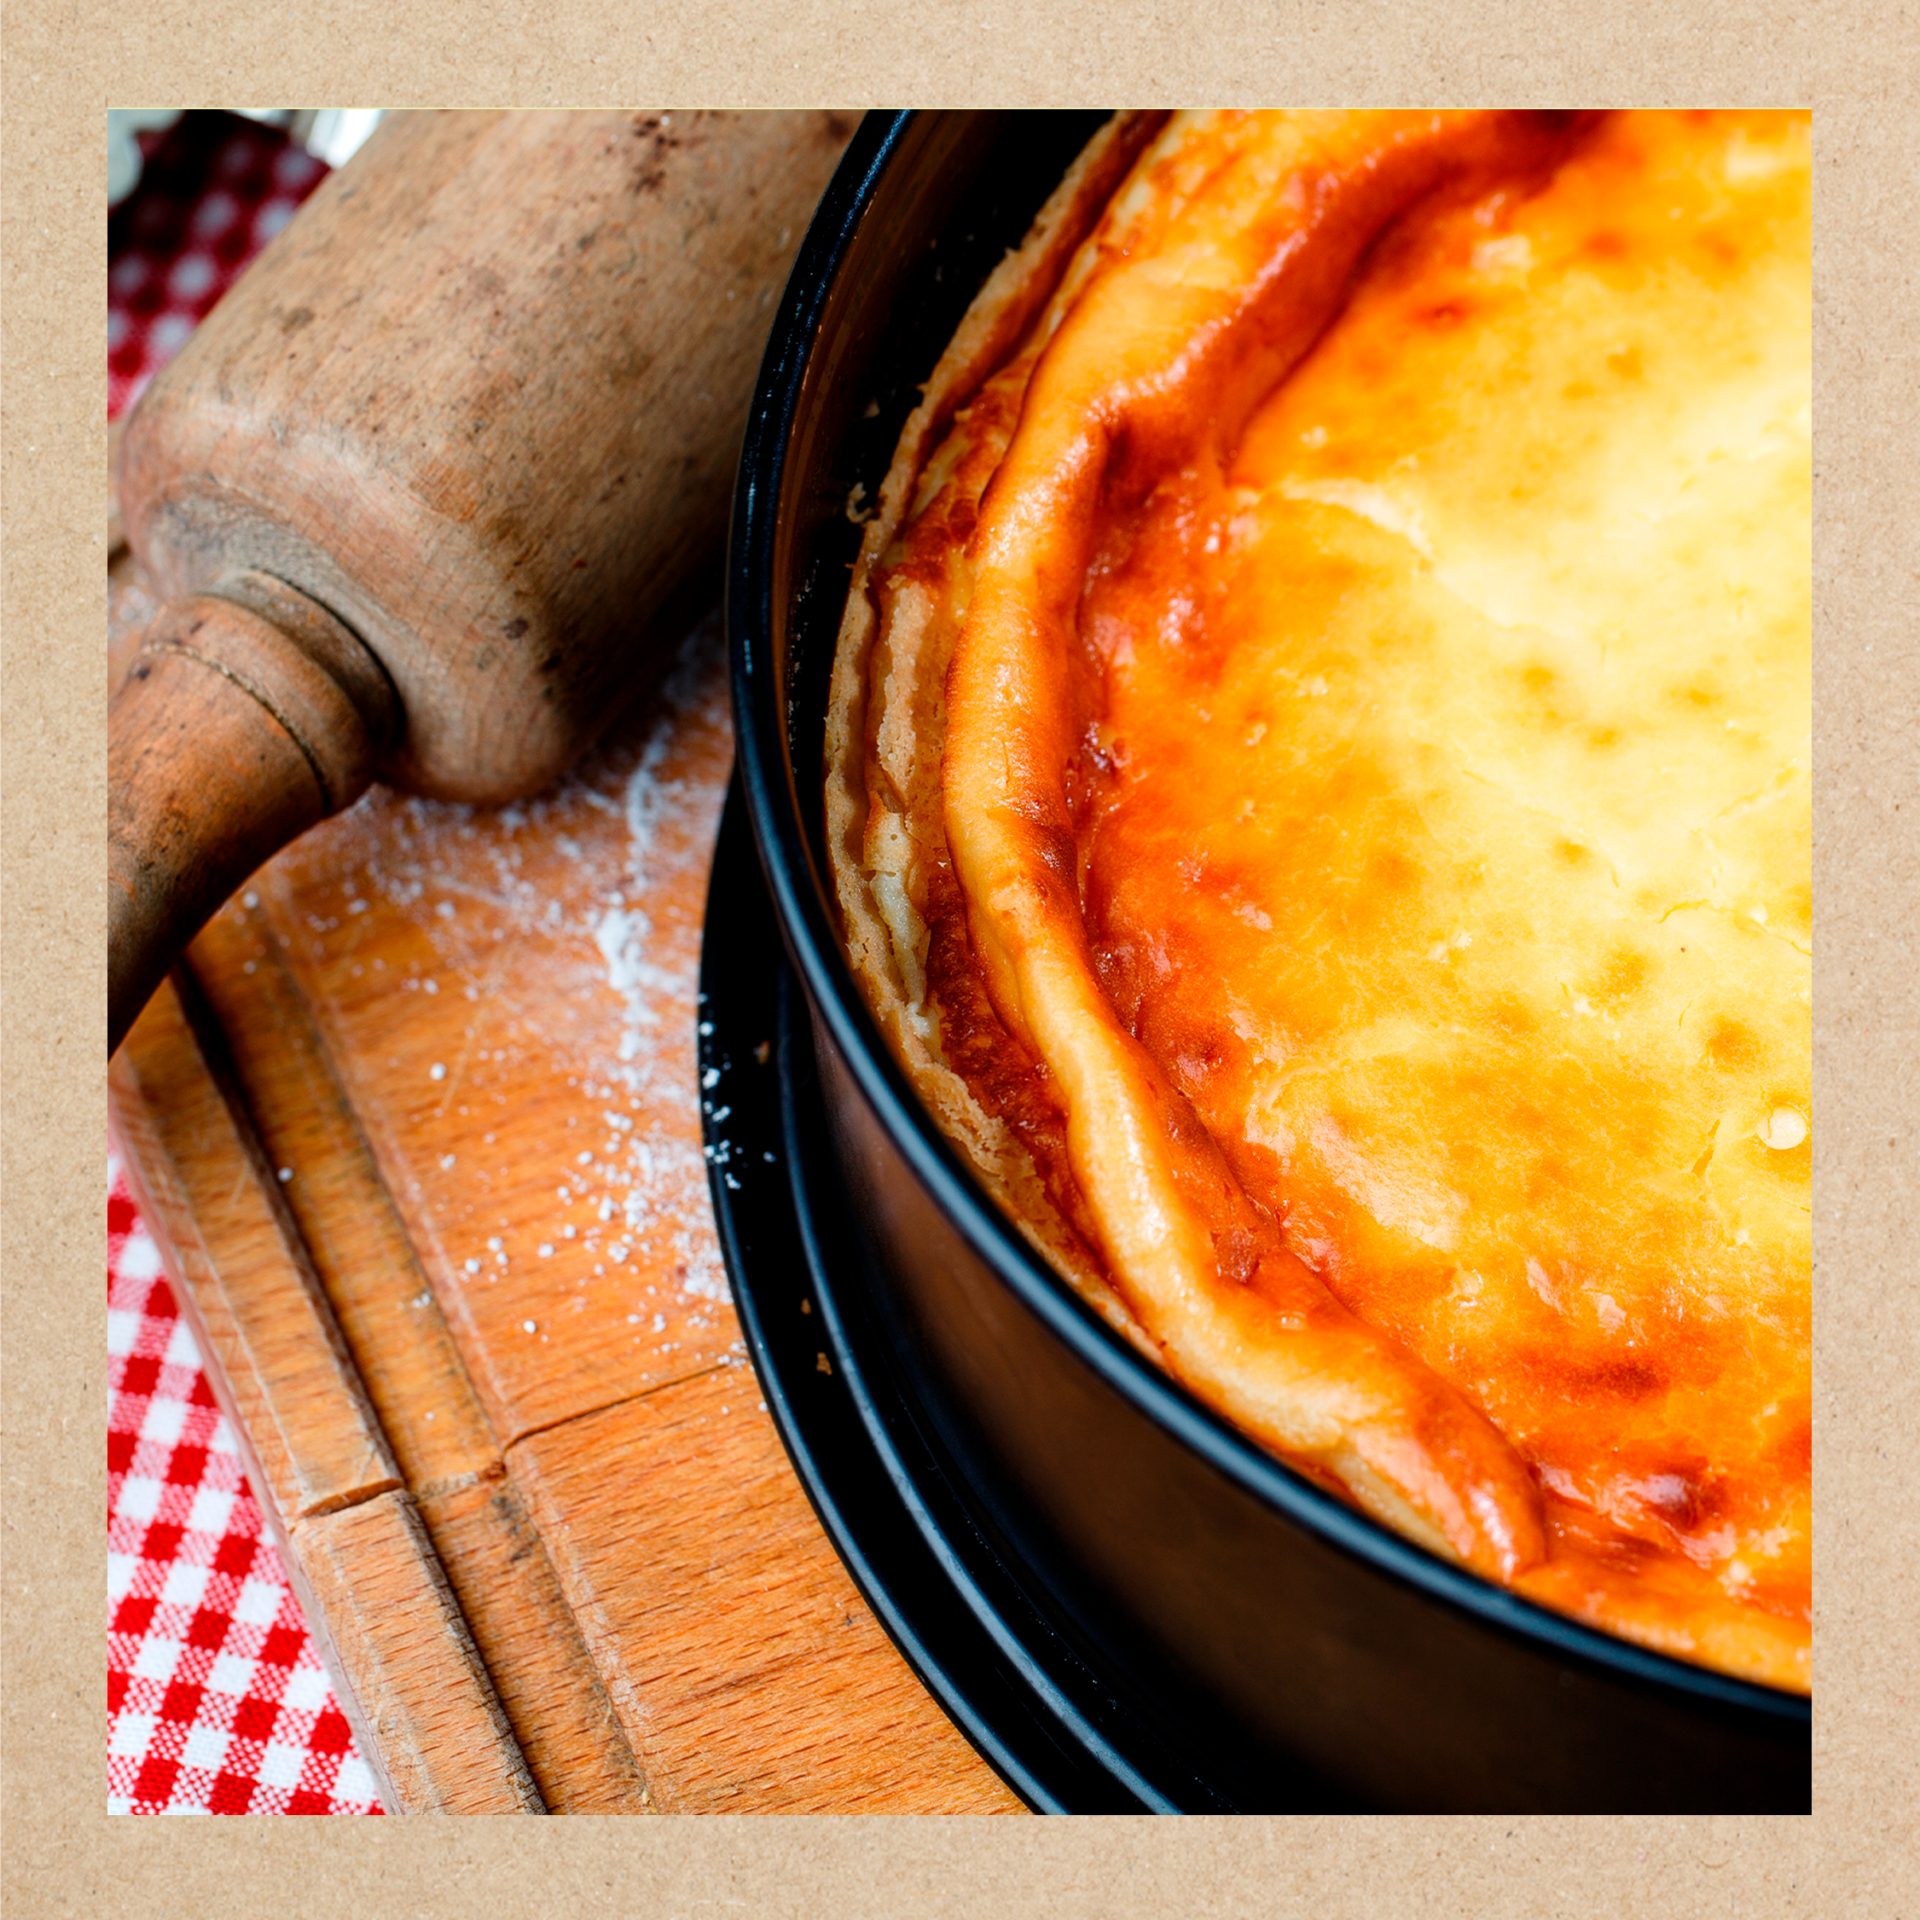 Imagen representativa de una tarta de queso